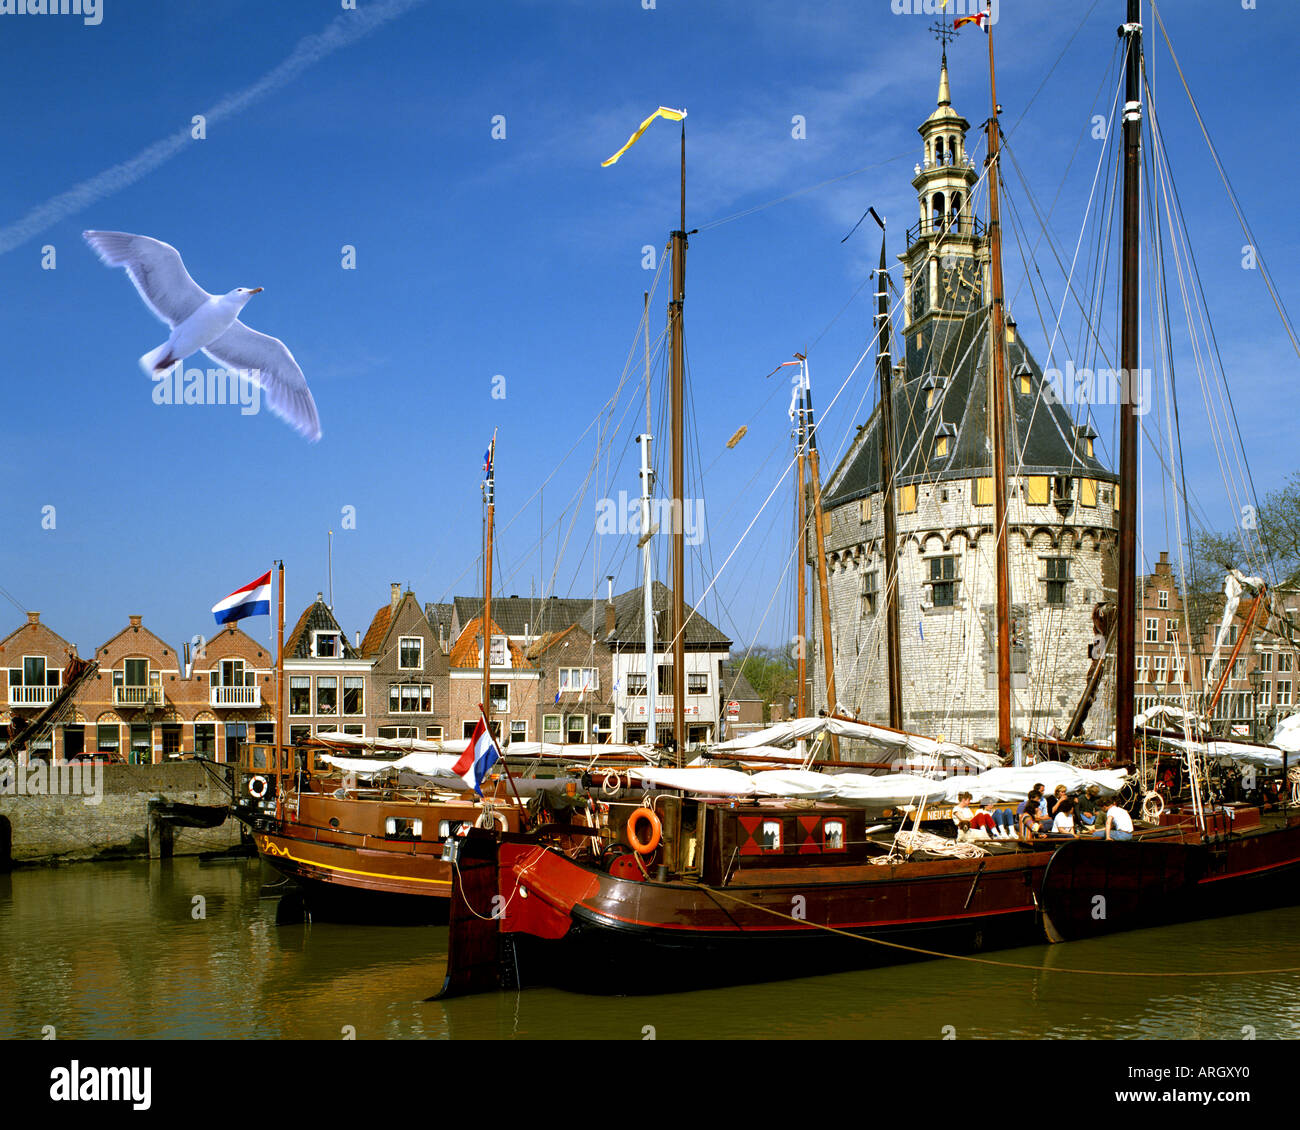 NL - NOORD HOLLAND: Hoorn Harbour - Stock Image